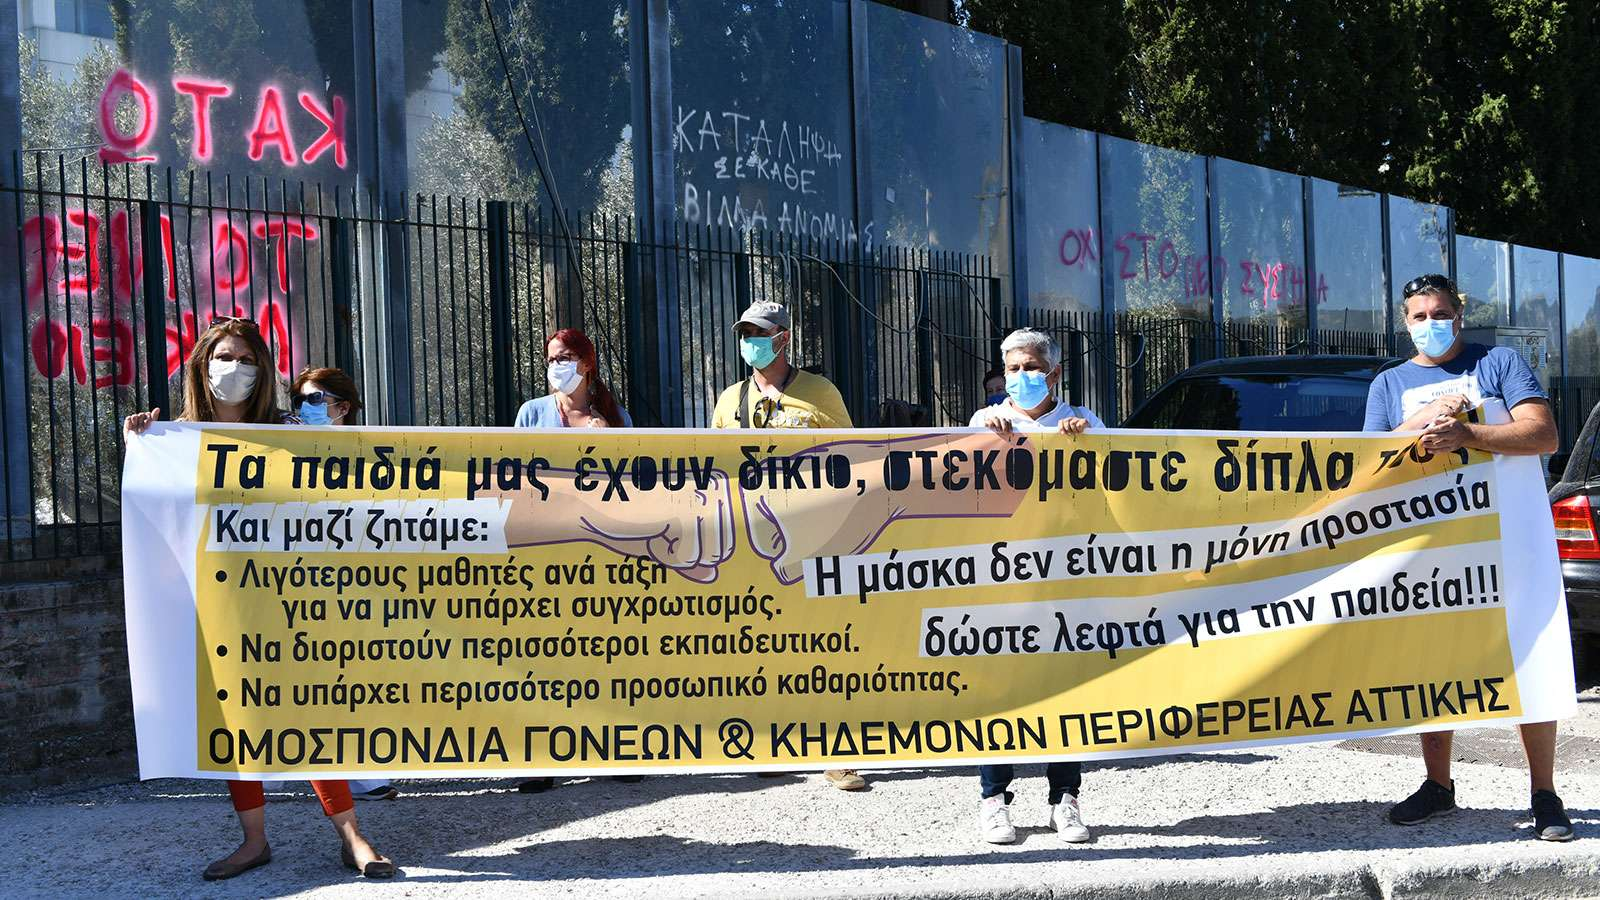 mathites kinitopoiisi Η κυβέρνηση έπνιξε με χημικά τη διαδήλωση 5